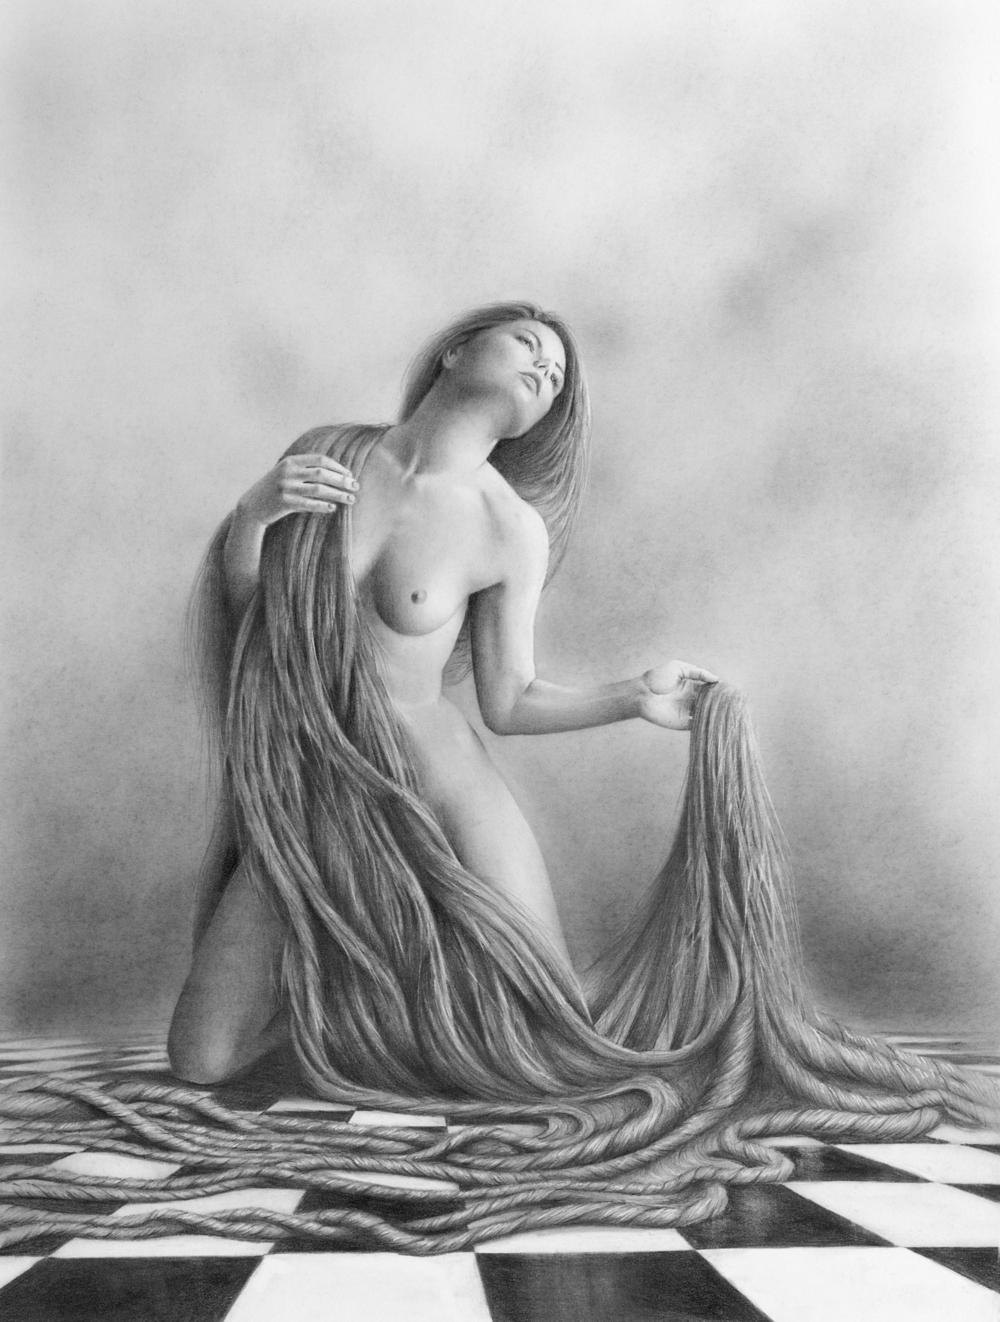 Delilah's remorse-bill-higginson-artist-graphite-drawing-realism-black-and-white